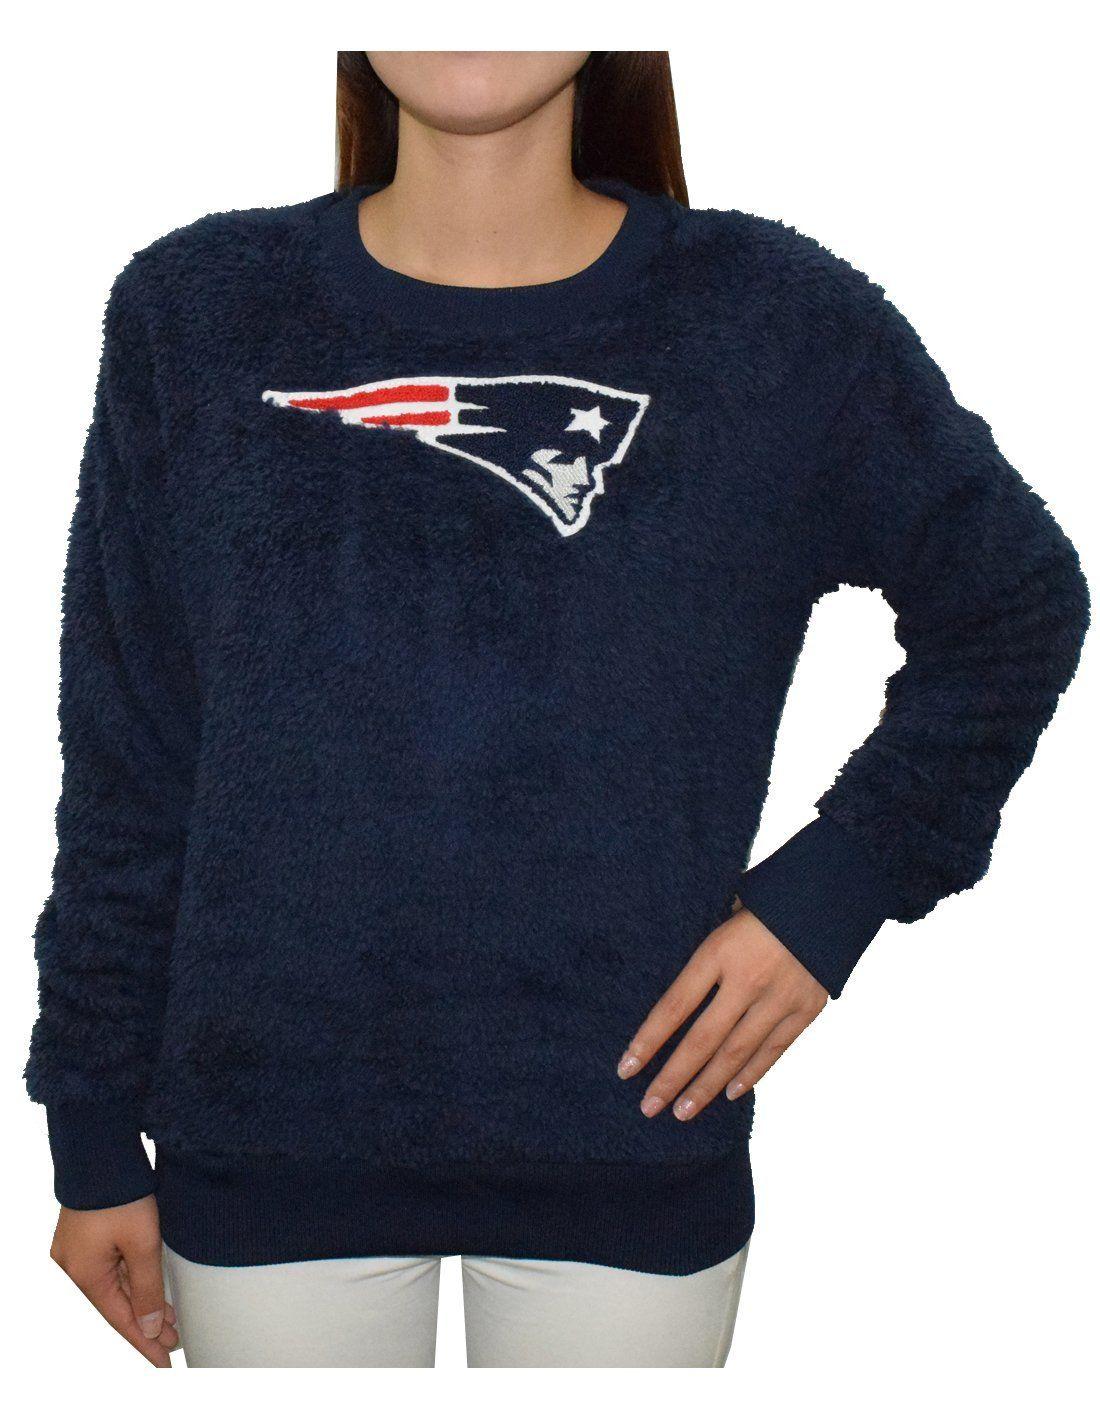 huge selection of c8797 fa012 Amazon.com: New England Patriots Athletic Warm Eyelash Knit ...